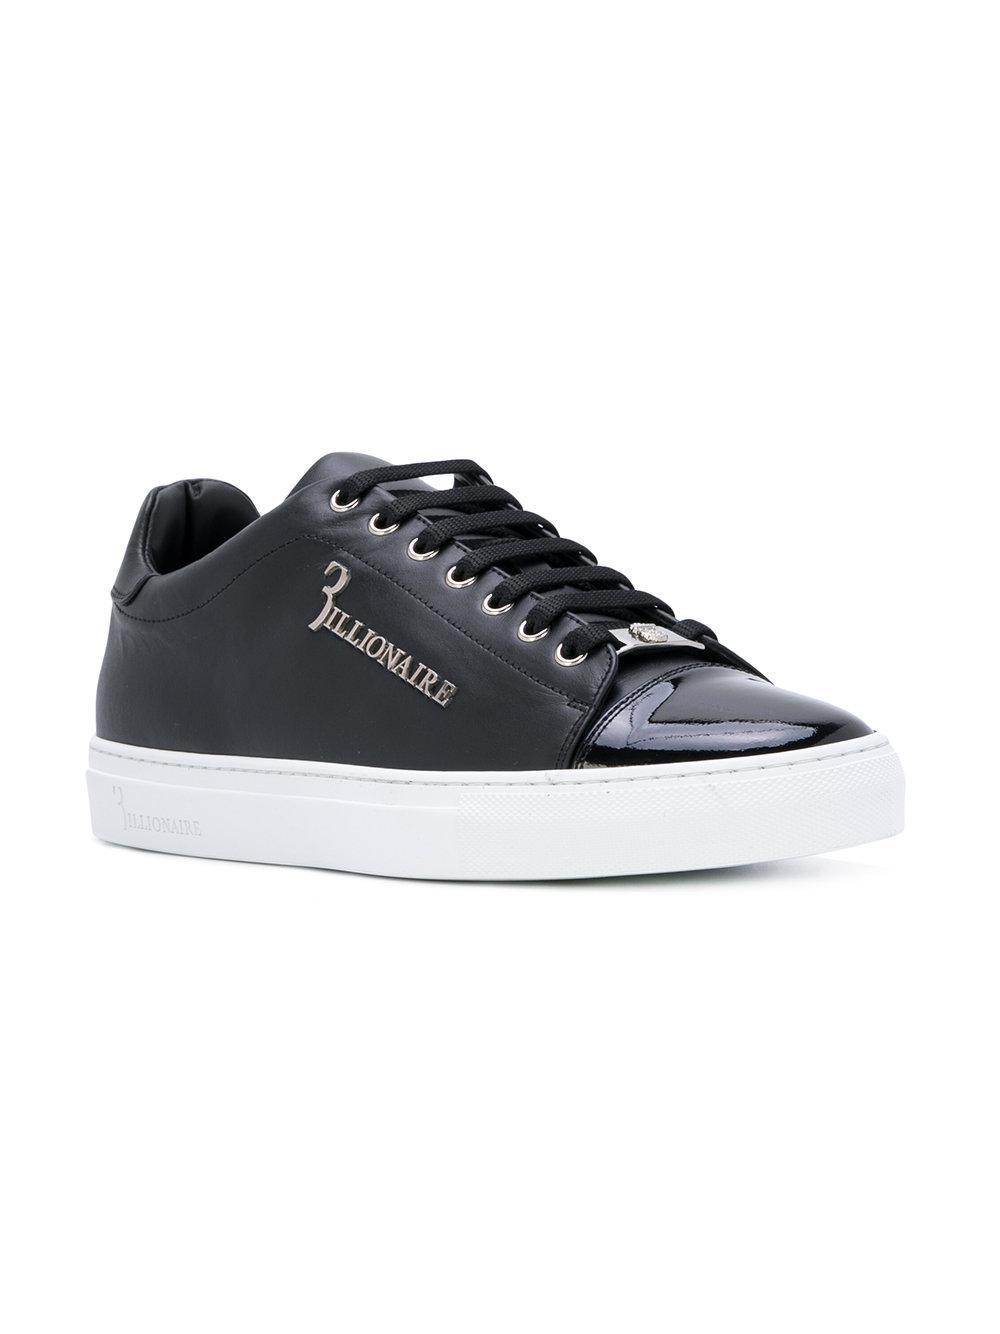 BILLIONAIREMetallic logo sneakers L2jIrx1azf